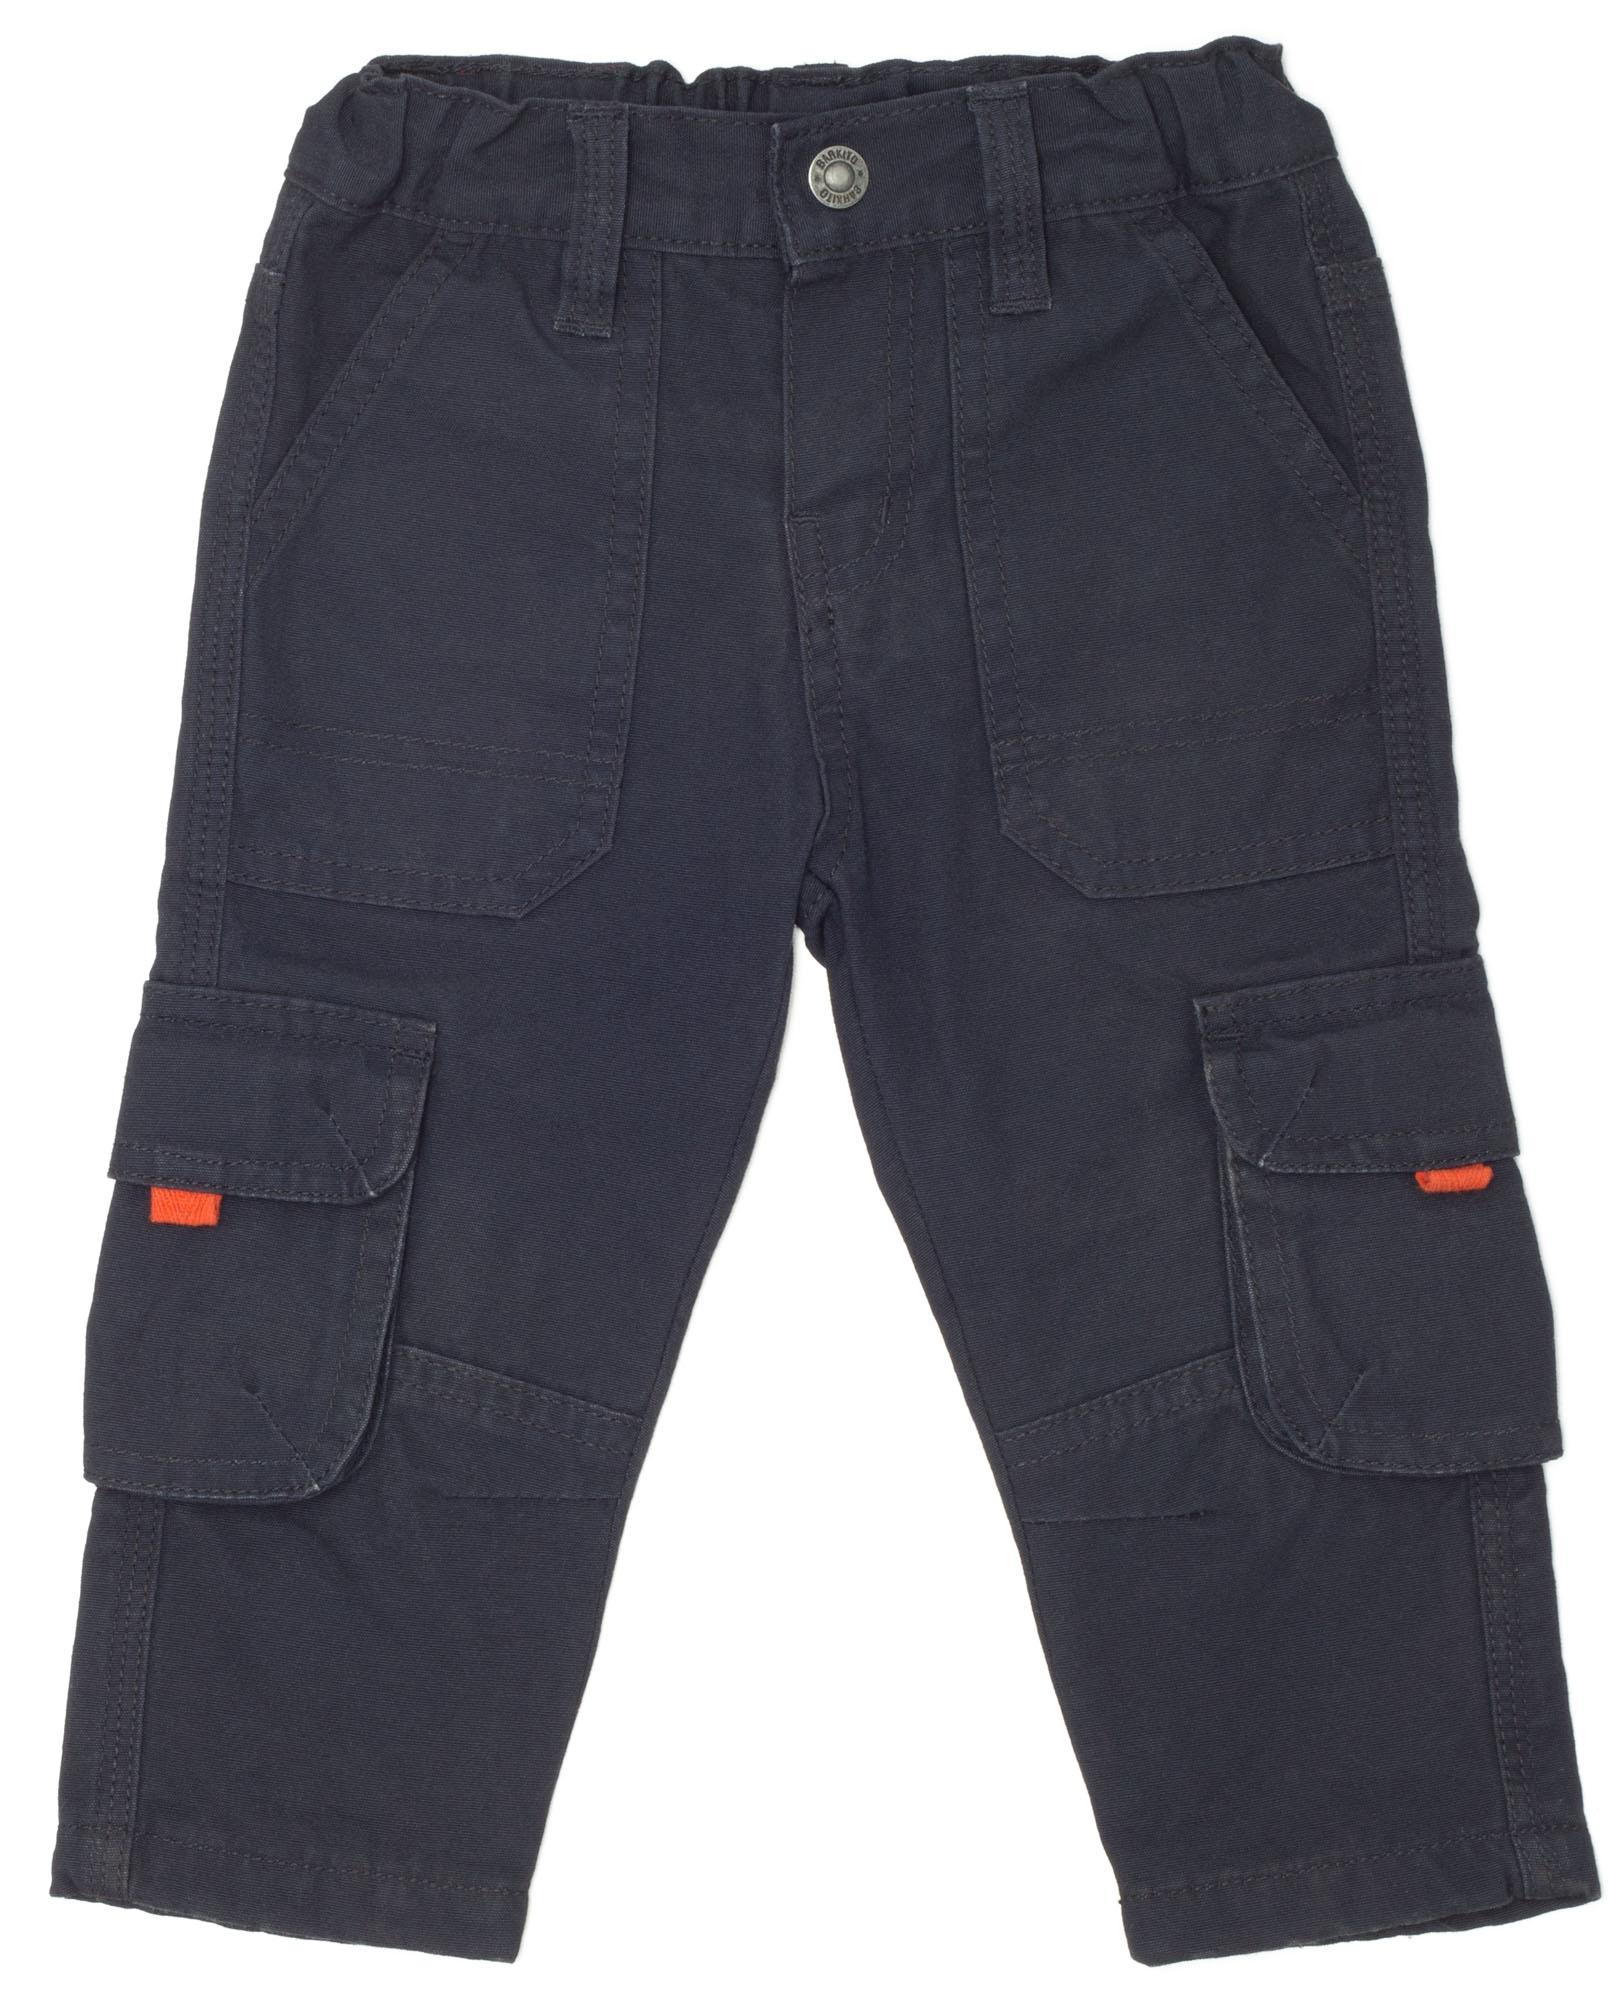 Брюки Barkito Брюки для мальчика Дино-строитель Barkito темно-синий брюки barkito салатовая